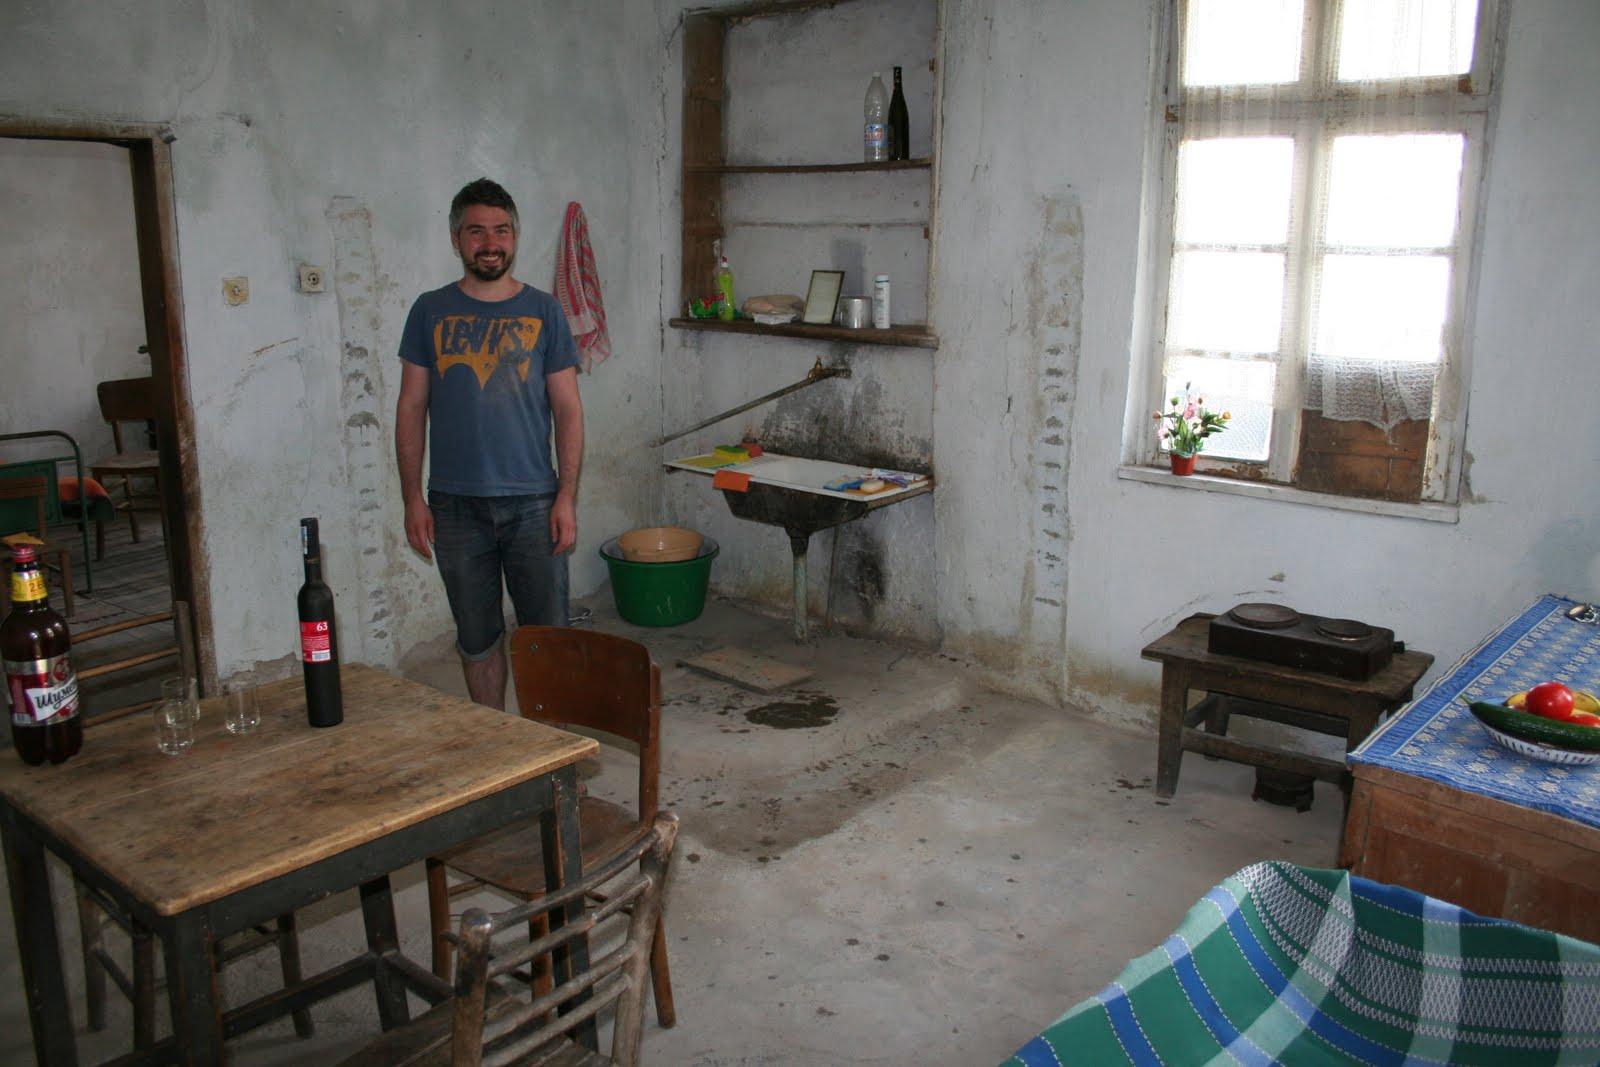 Англичане в Болгарии.Роб и Клэр